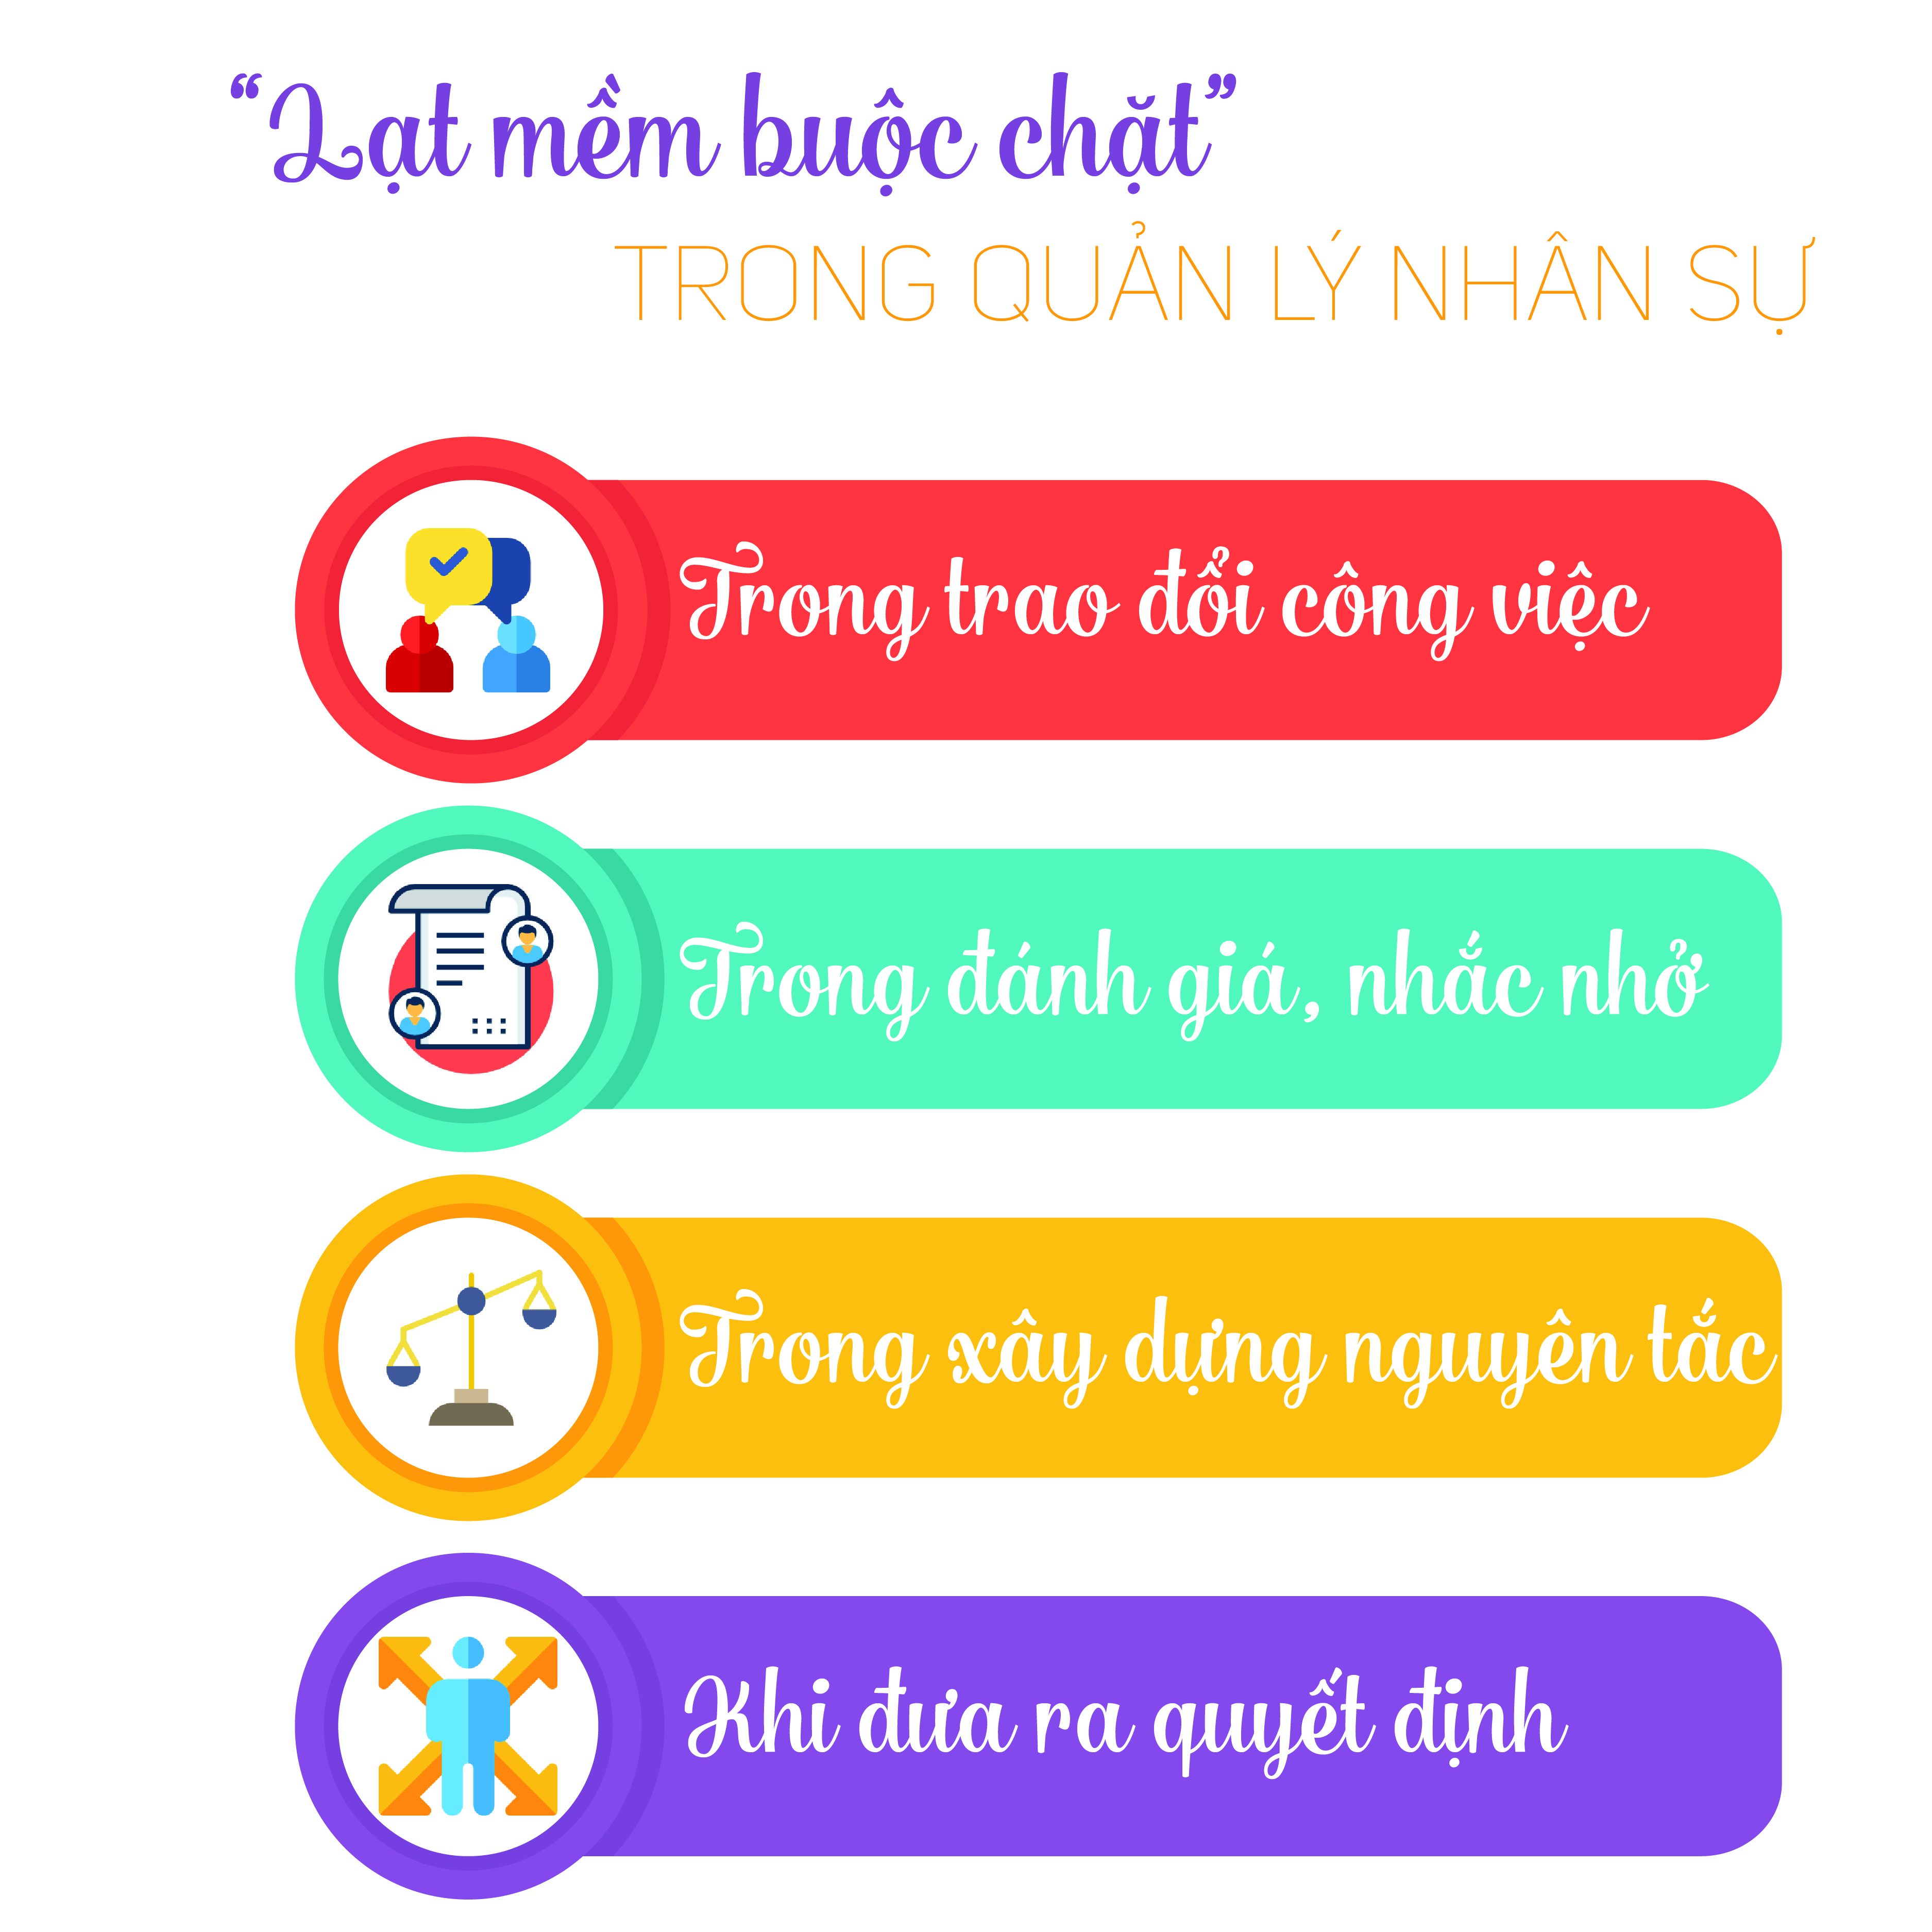 lat-mem-buoc-chat-trong-quan-ly-nhan-su-01